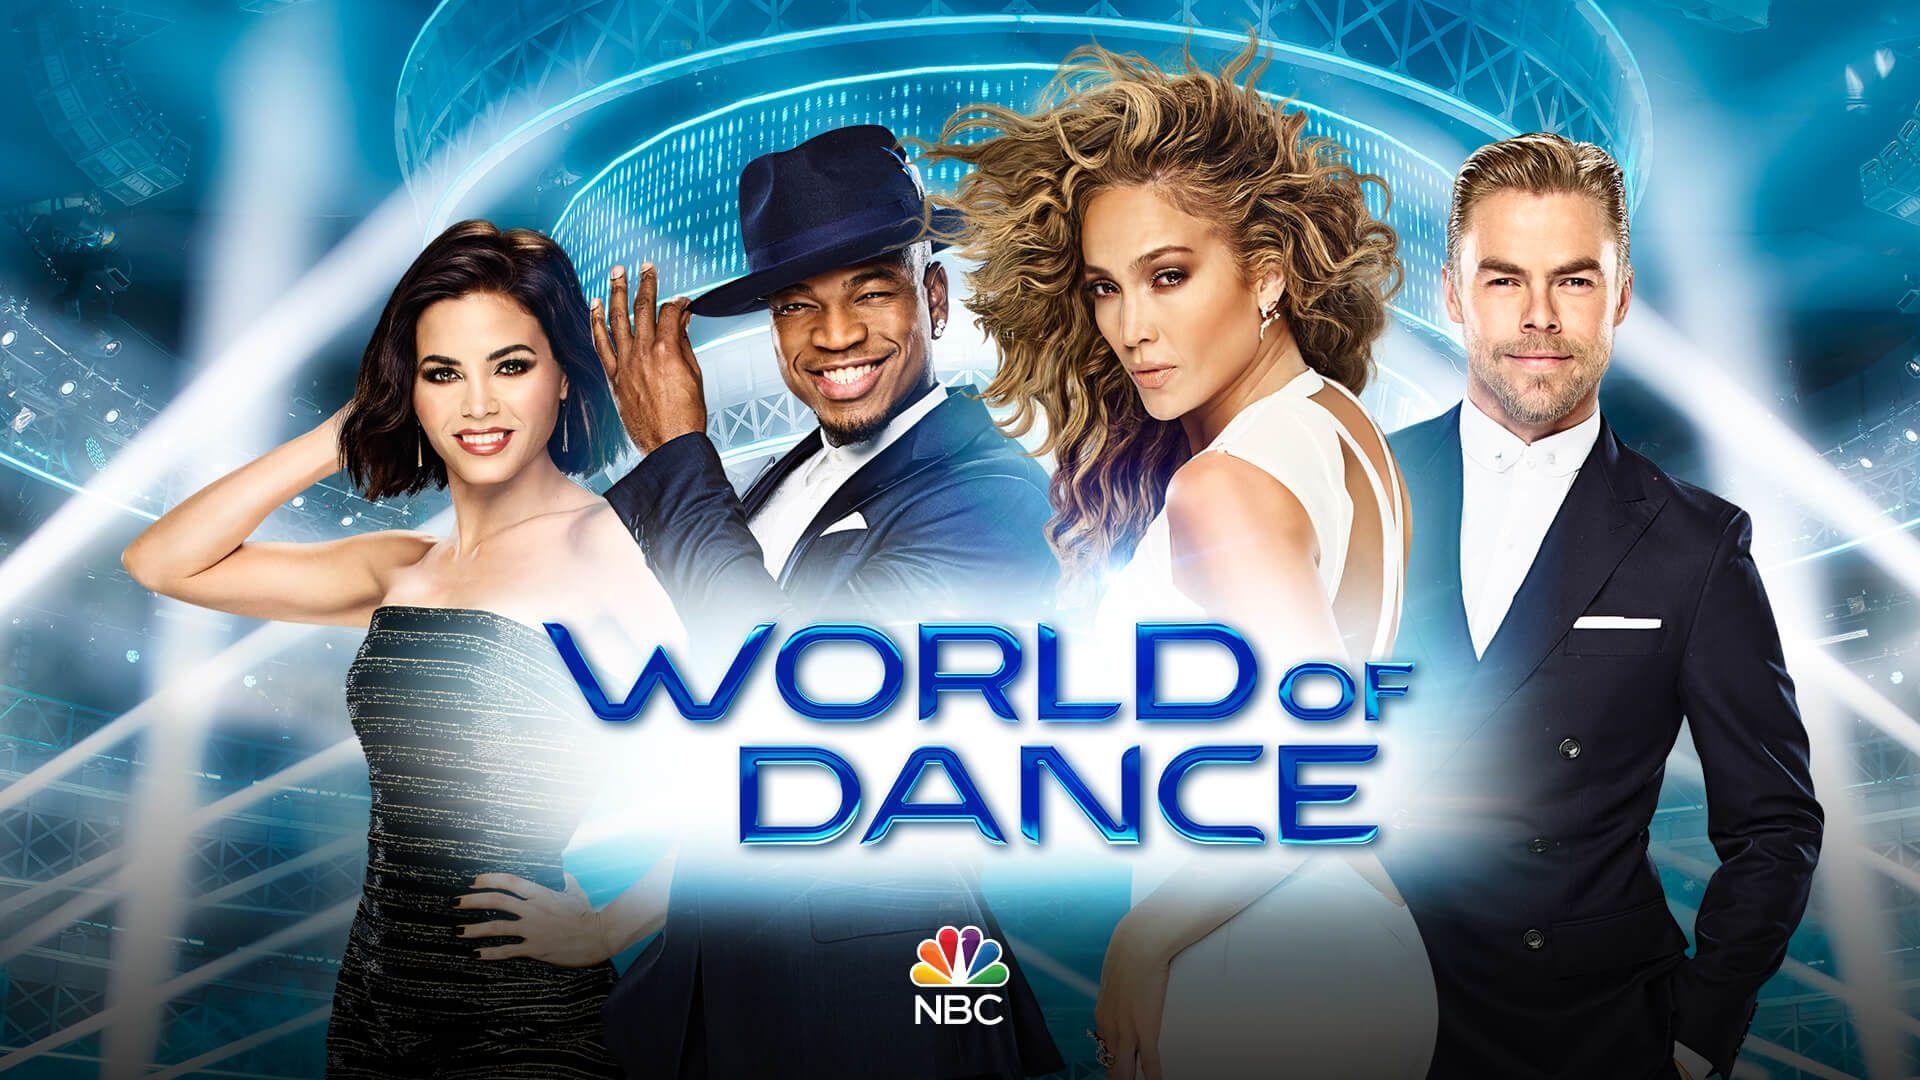 World, of, dance, season 2, episode, 6, recap, qualifiers, night, 2018, dancers, results, duels